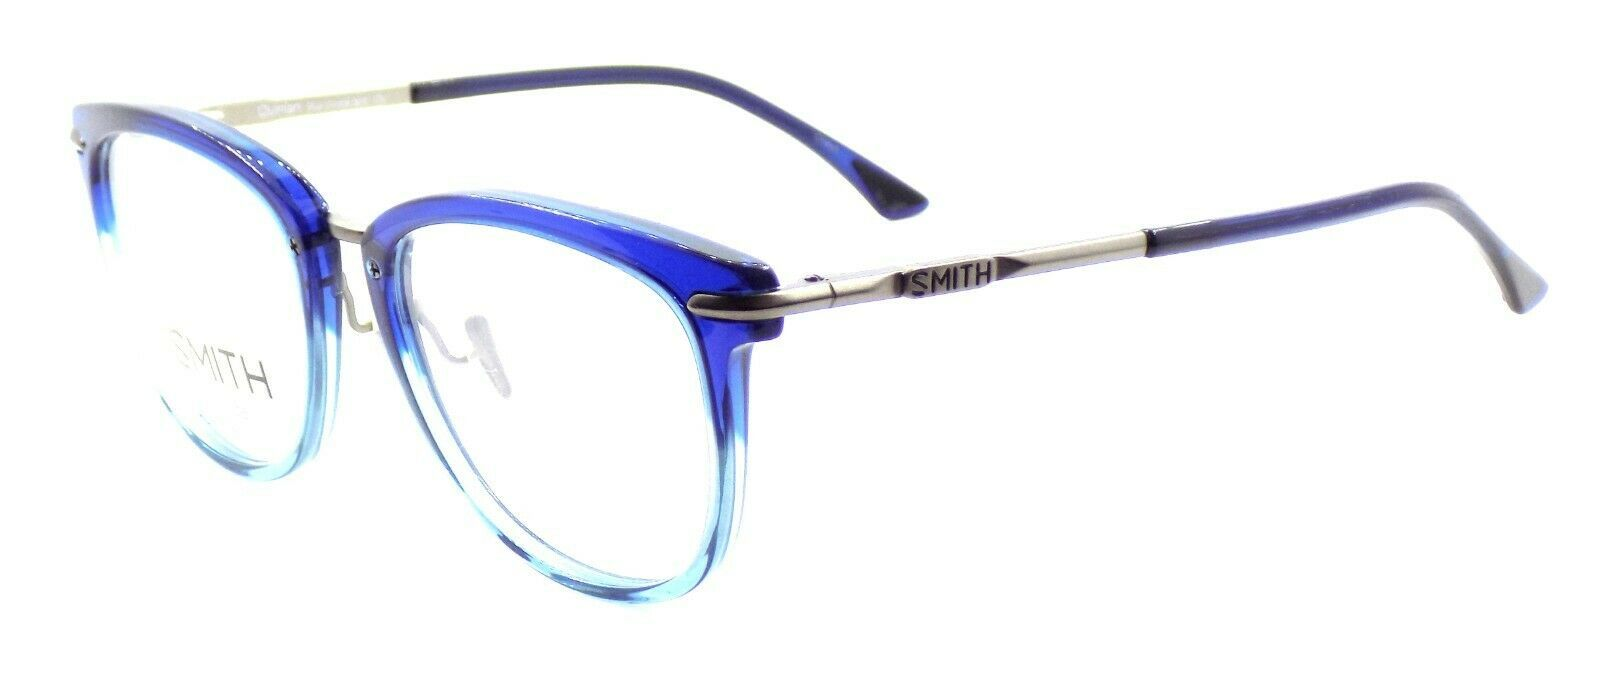 SMITH Optics Quinlan IOV Unisex Eyeglasses Frames 51-19-140 Blue Crystal Split - $93.70